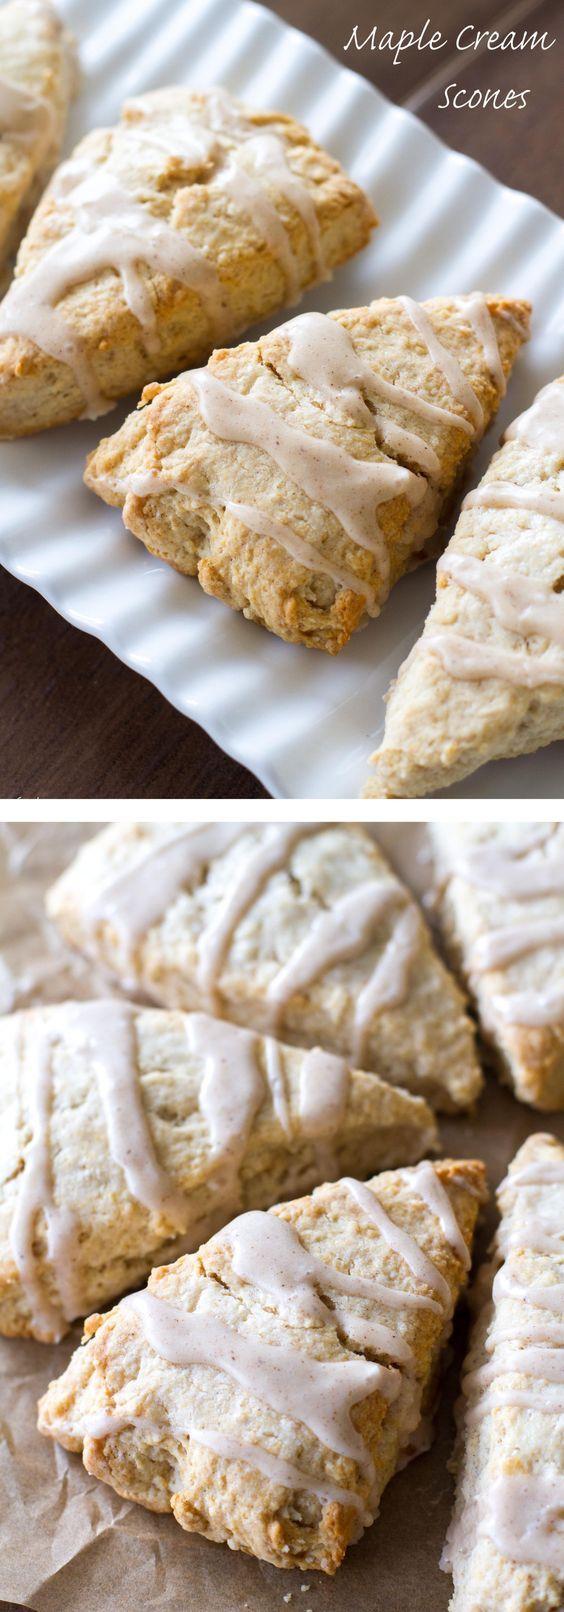 Maple Cream Scones | Recipe | Sweet, Cinnamon and Spices